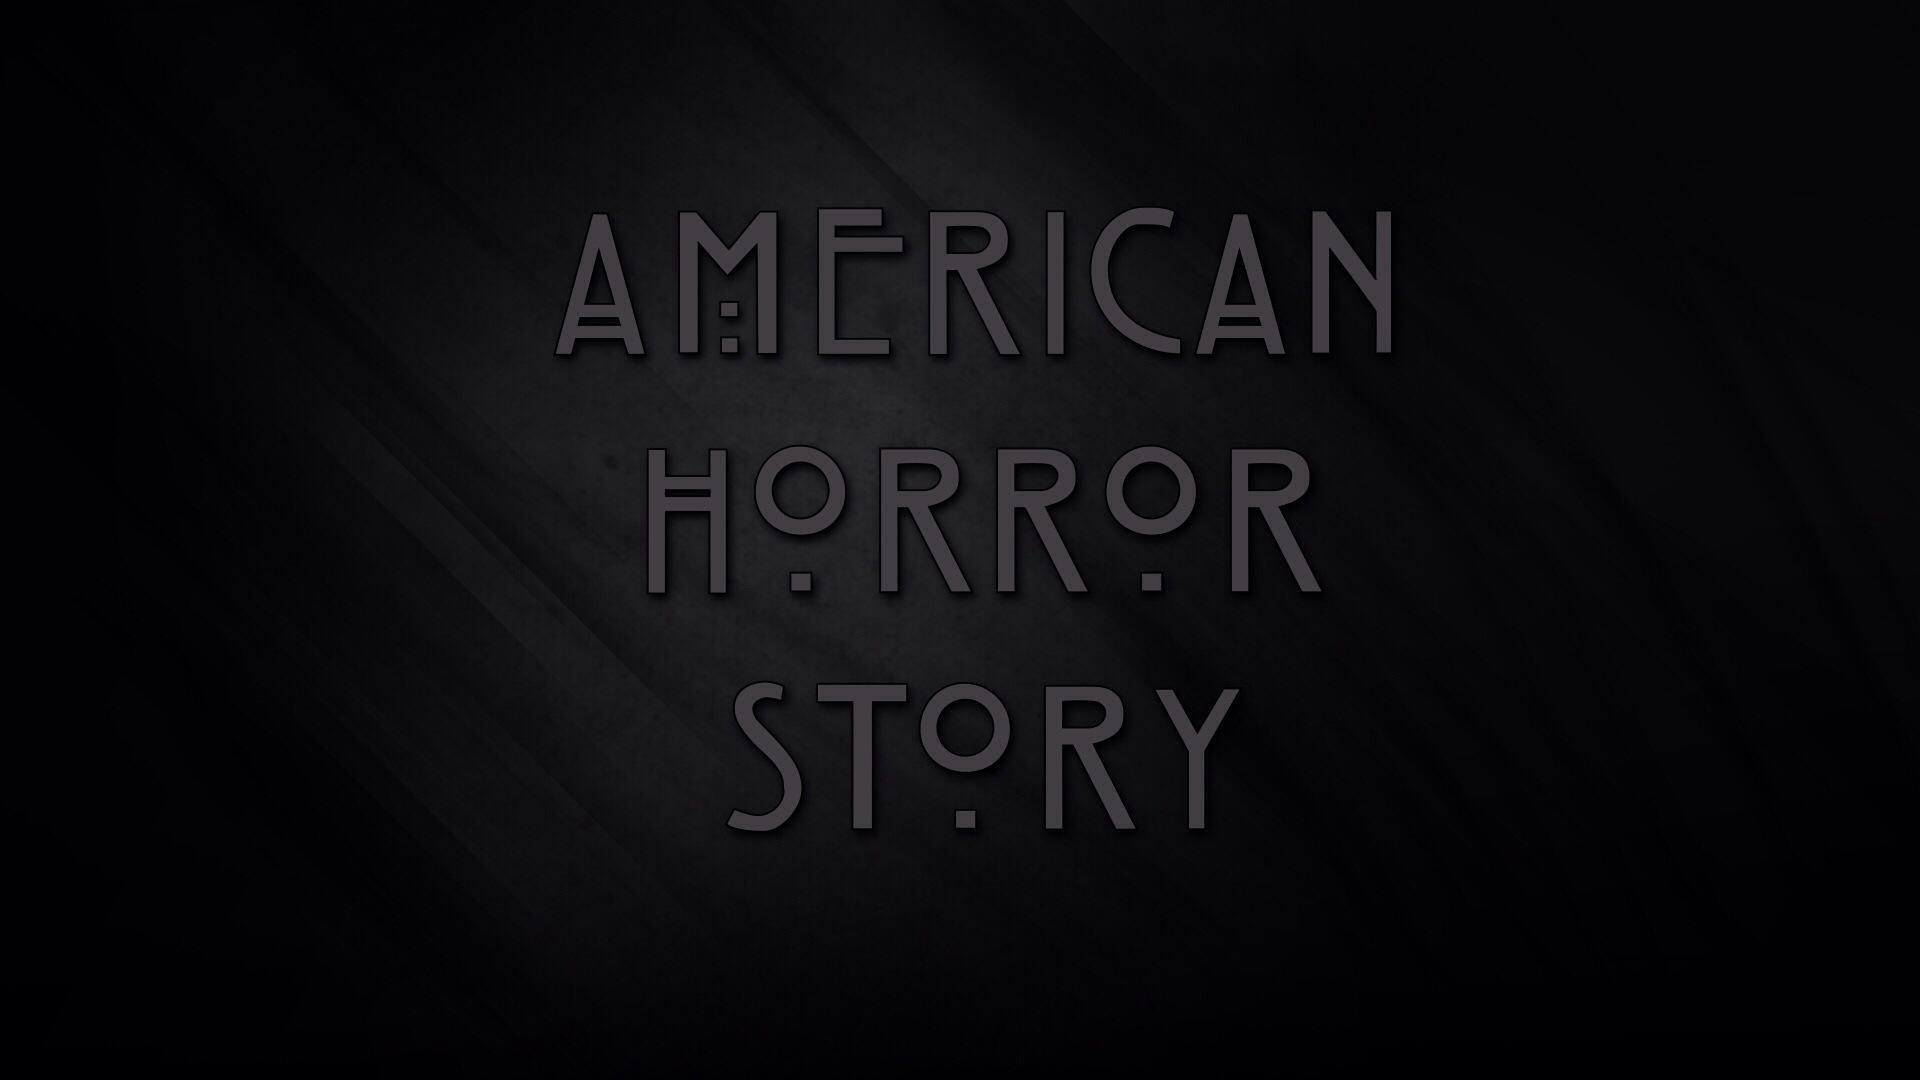 49 American Horror Story Wallpapers On Wallpapersafari